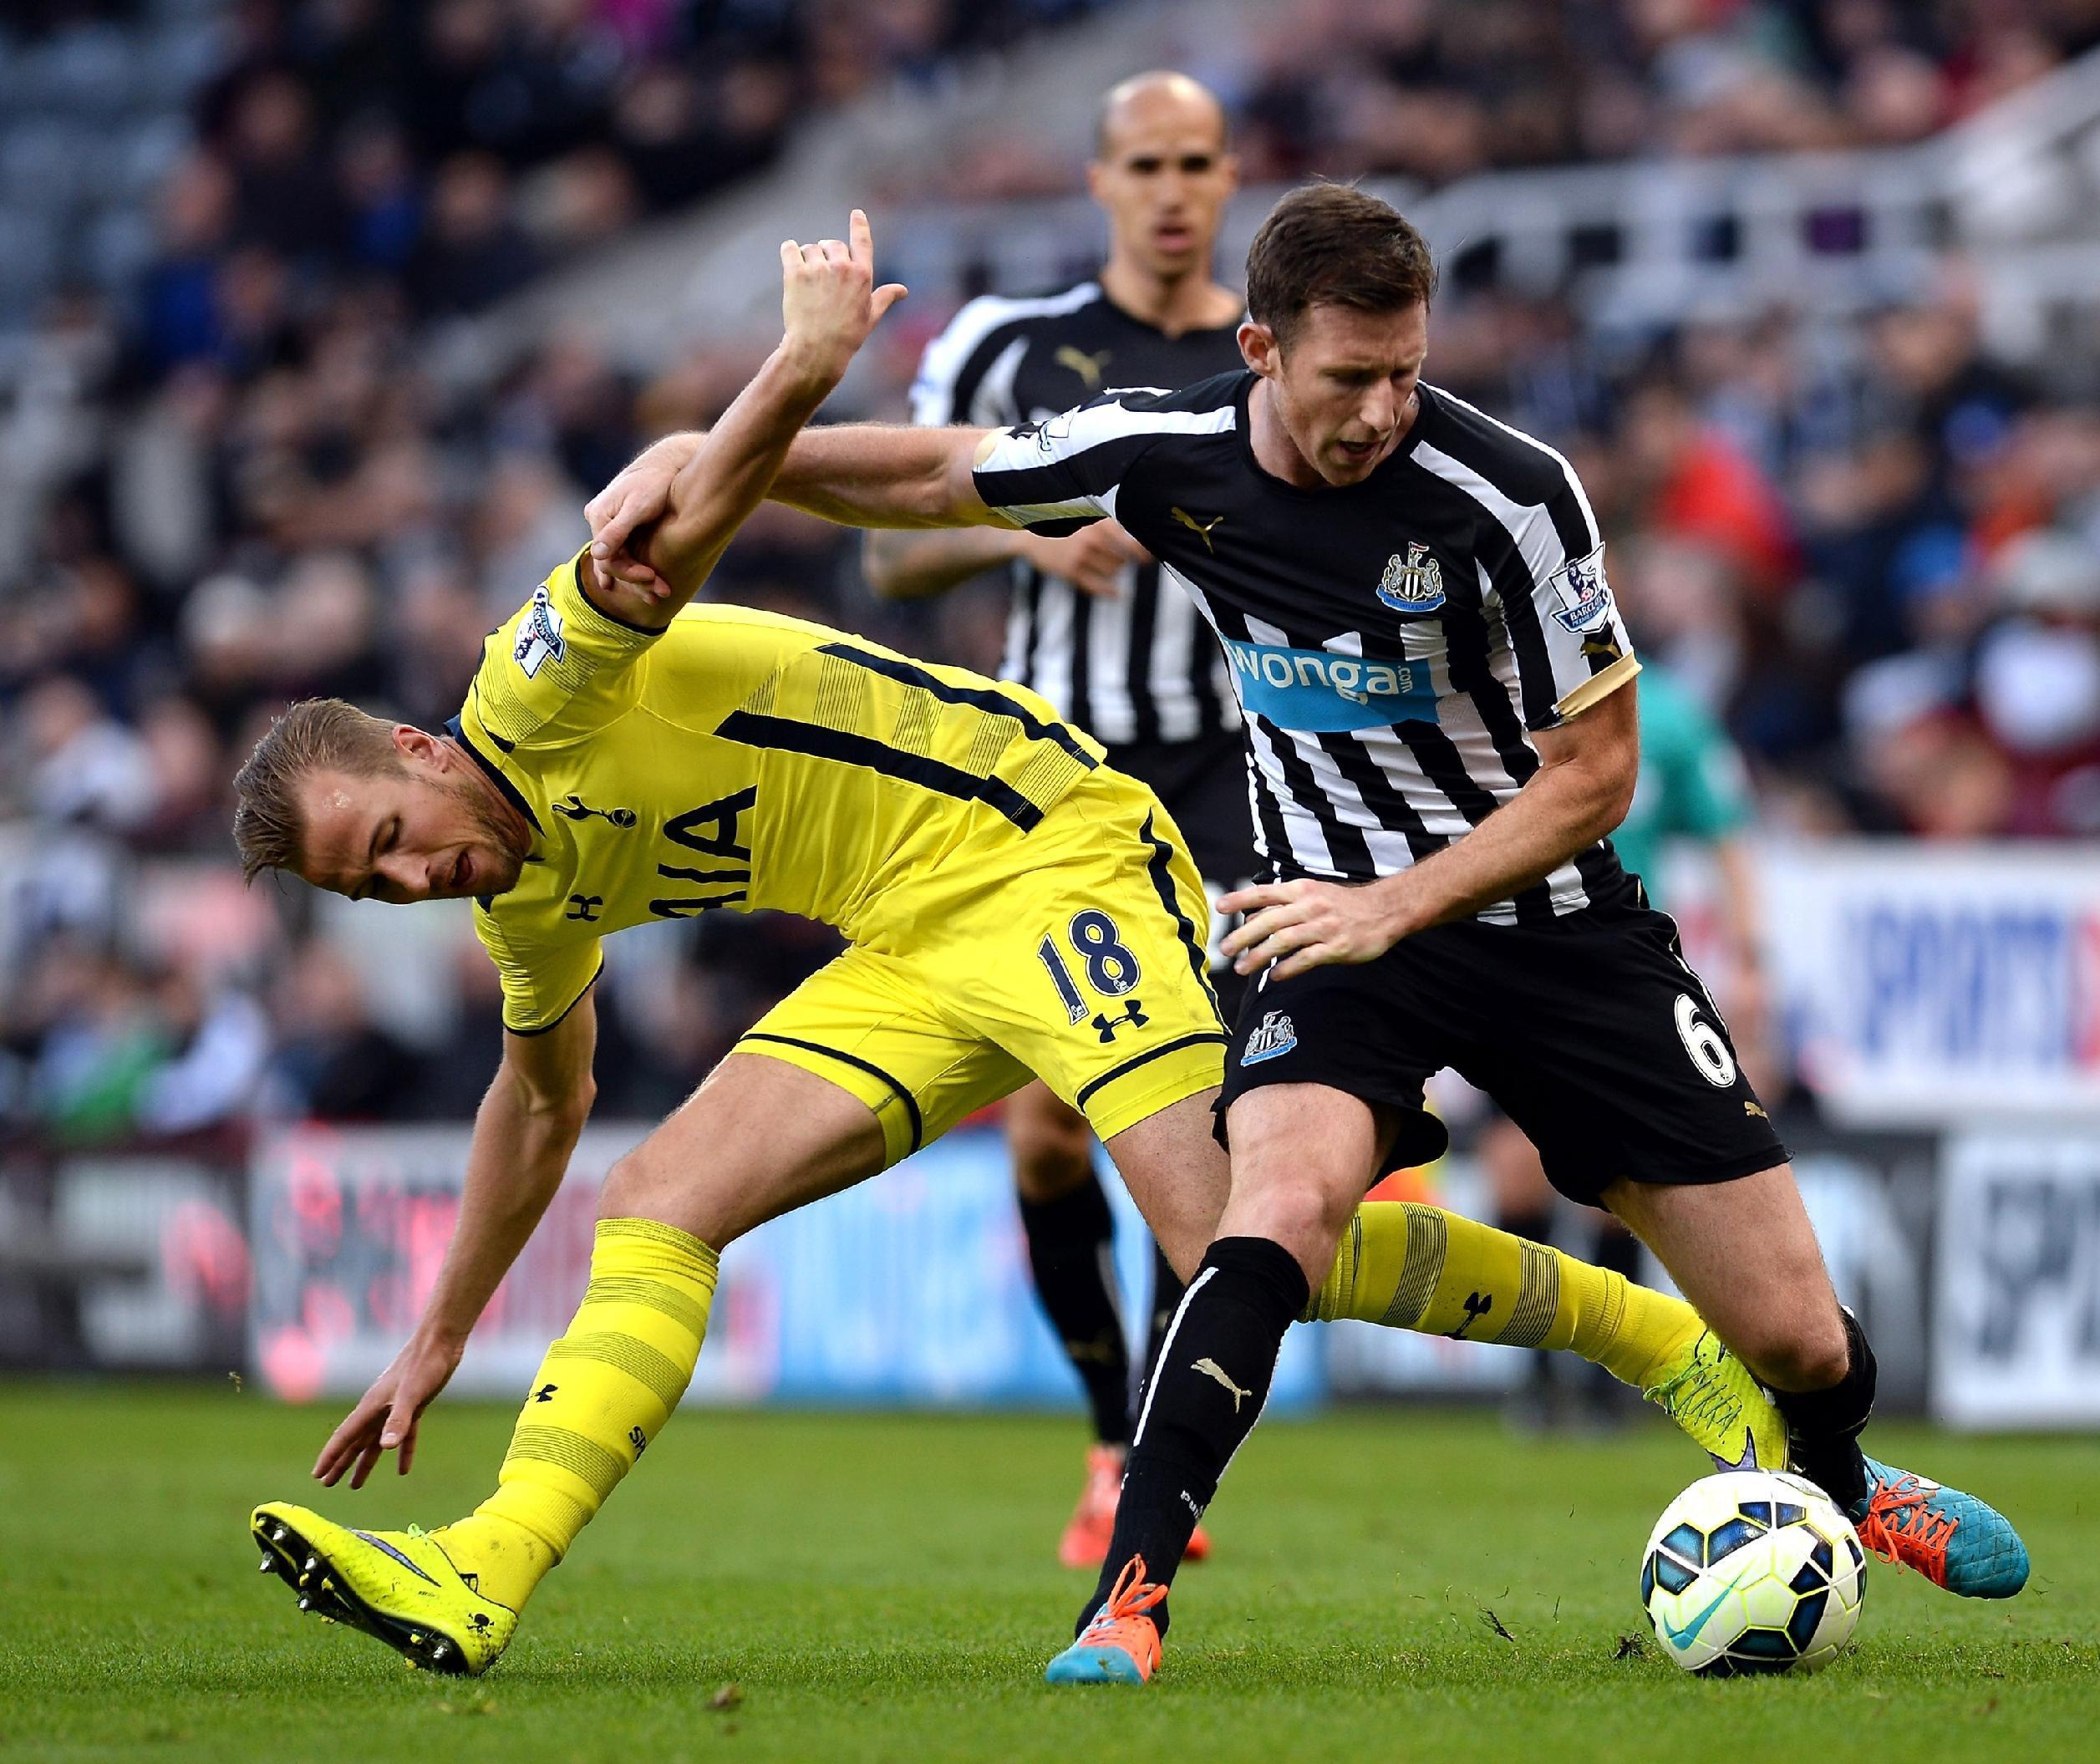 Christian Eriksen In Tottenham Hotspur V Newcastle United: Photo Gallery